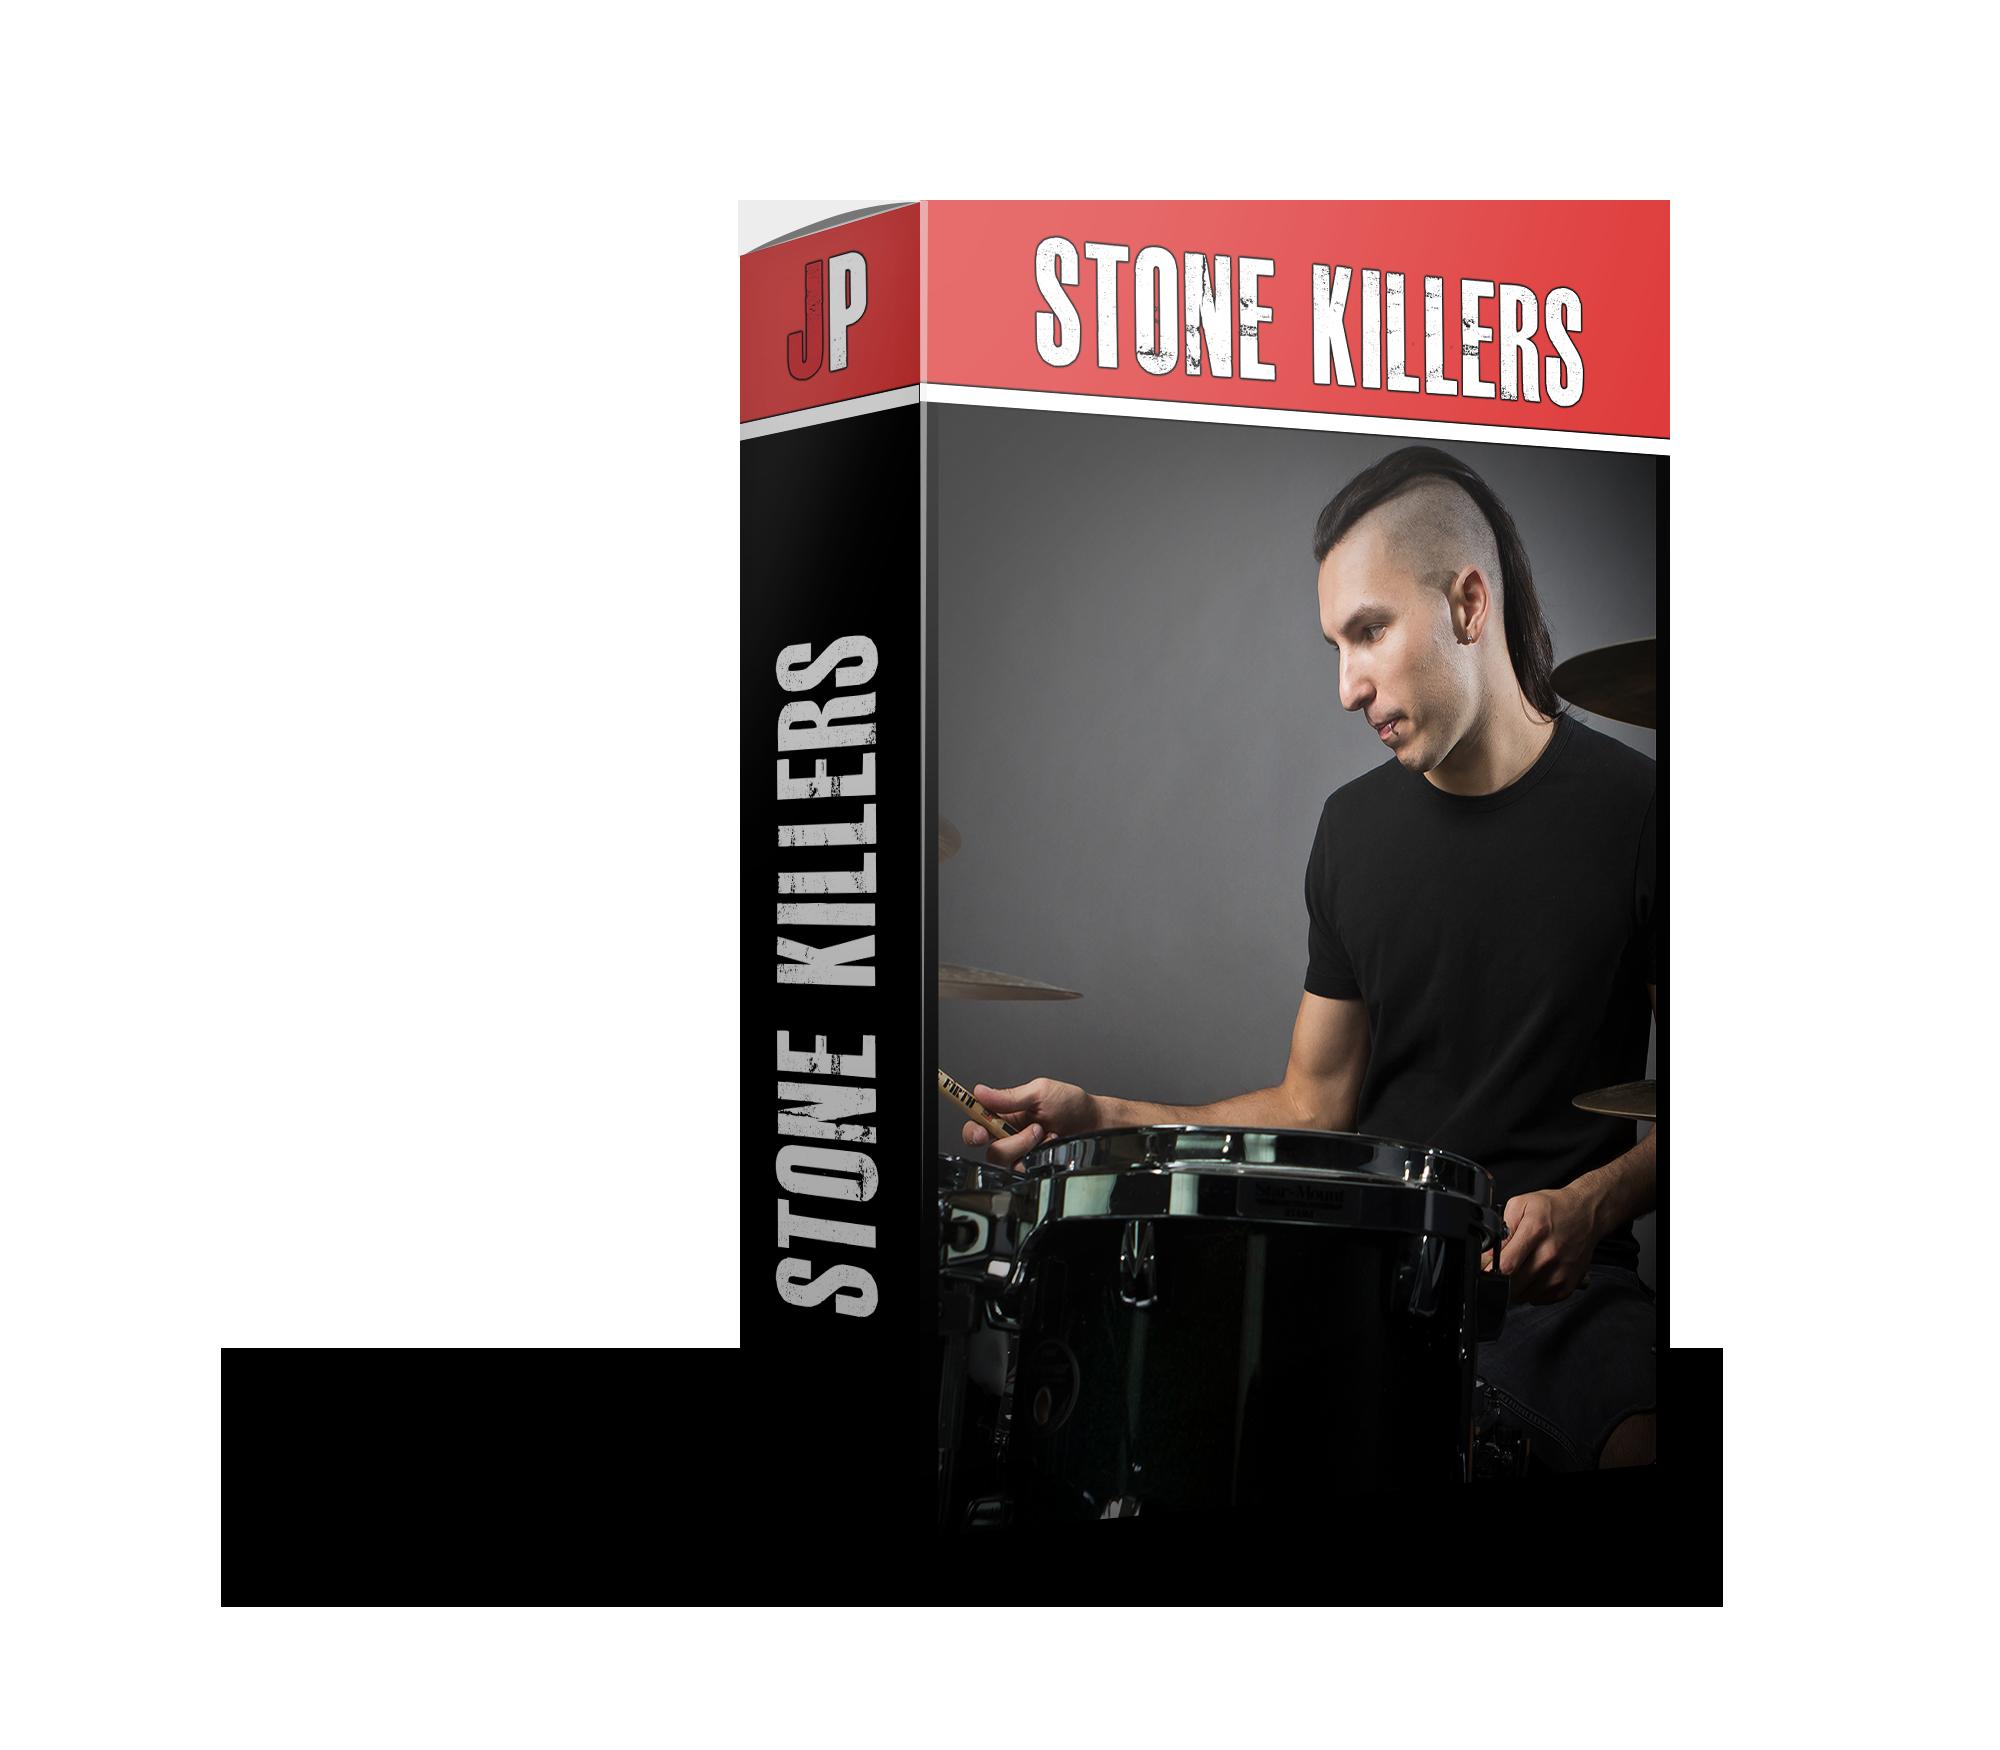 Stone Killers course image